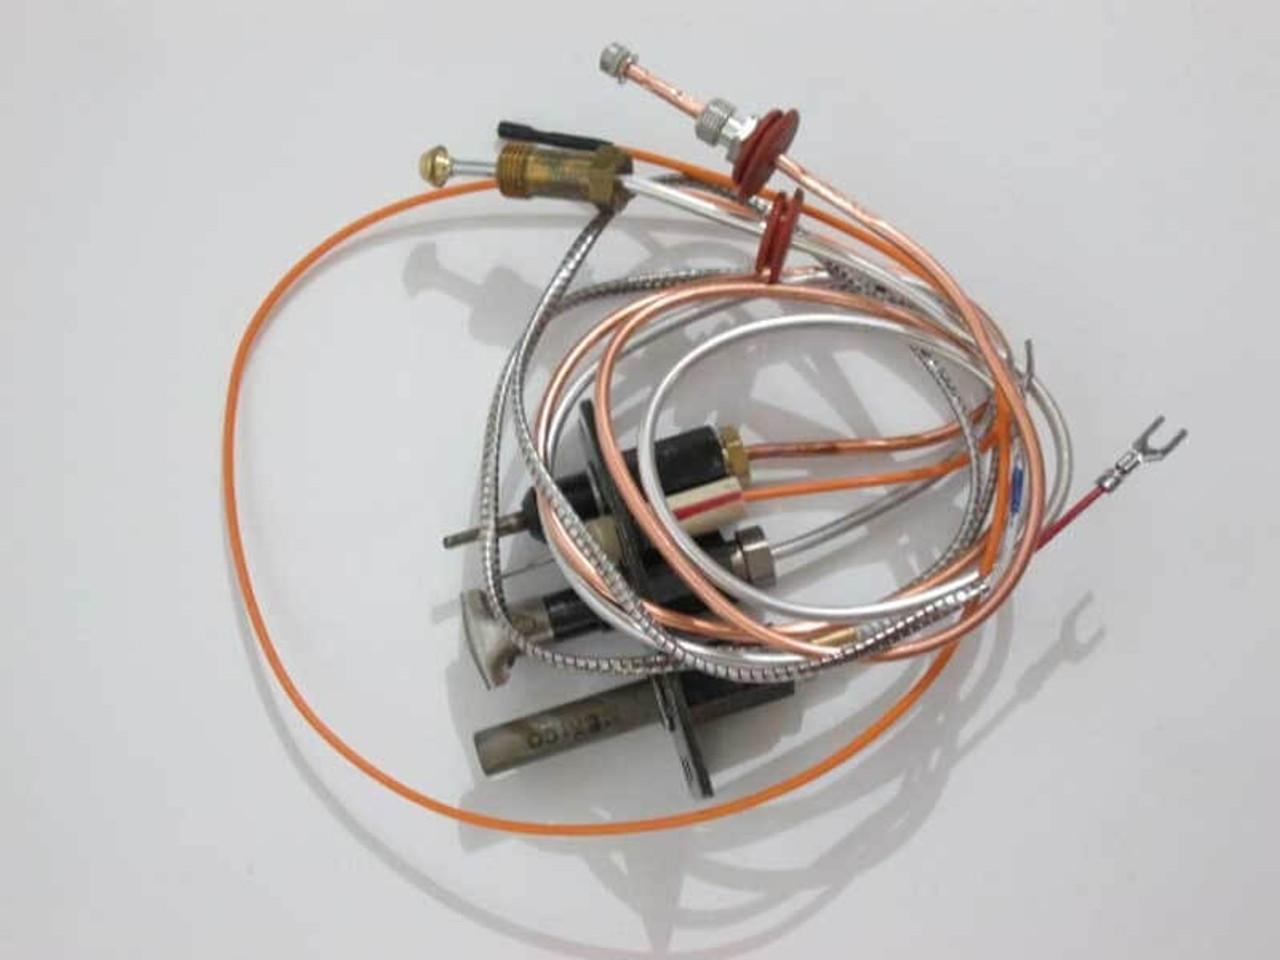 4021 737 2__80090.1493909675.1280.1280__74132.1503924981?c=2 quadra fire, heat & glo and heatilator pilot assembly lp 4021 737  at bakdesigns.co